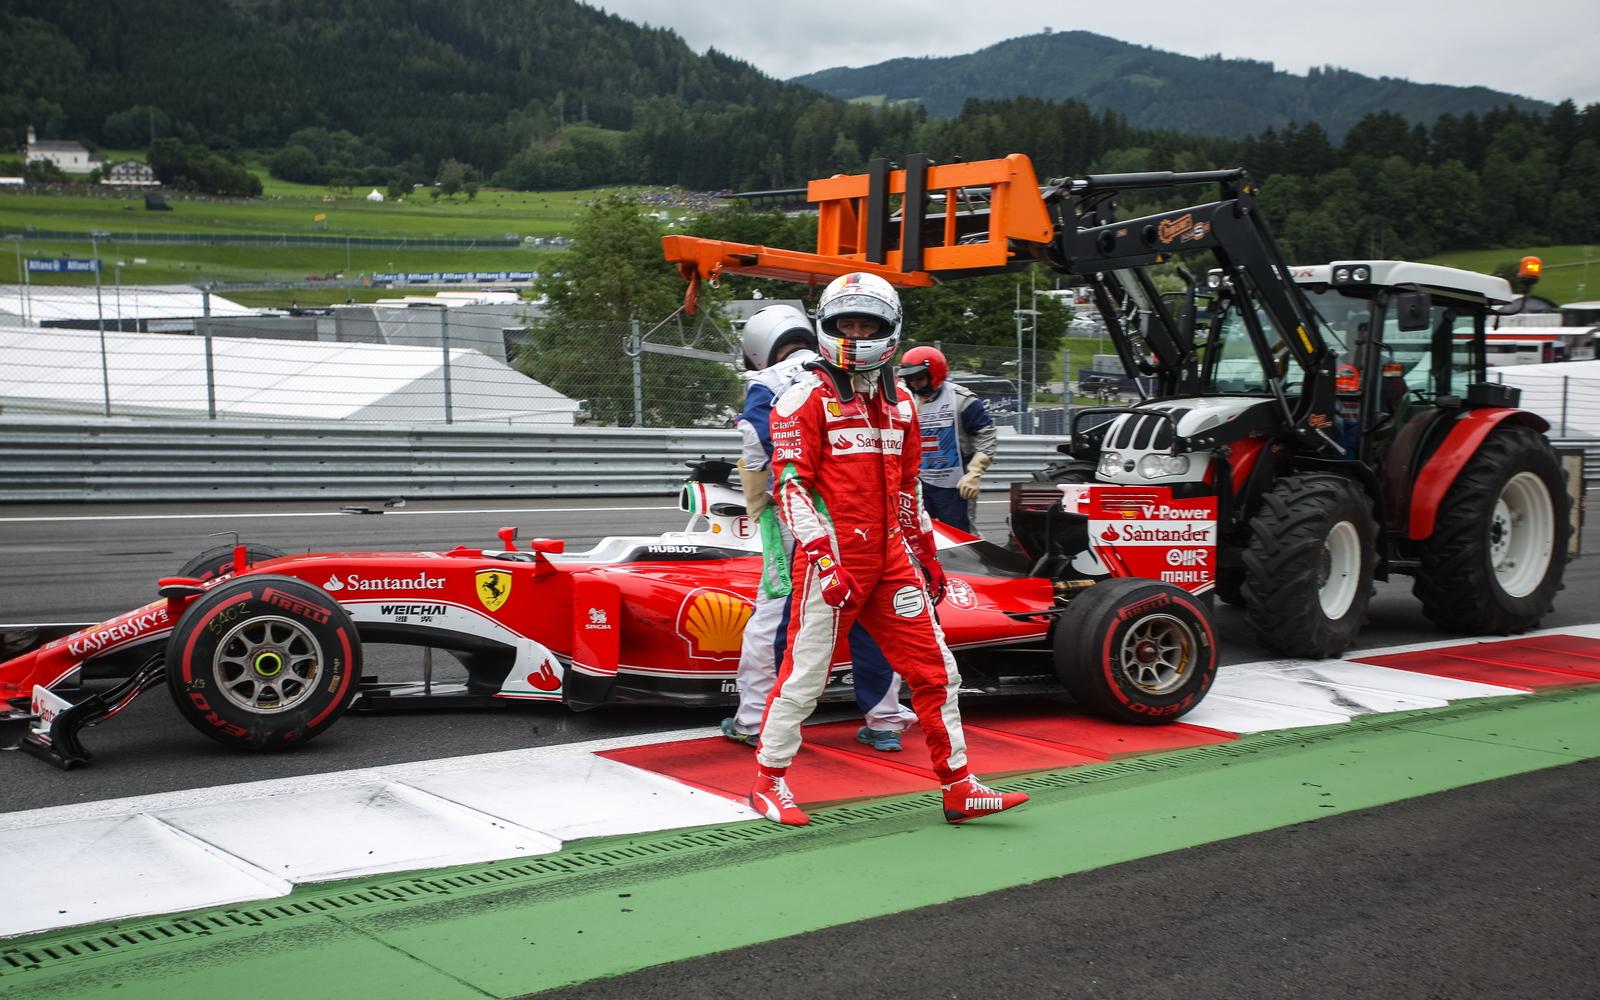 2016_austrian_gp_race_068.jpg